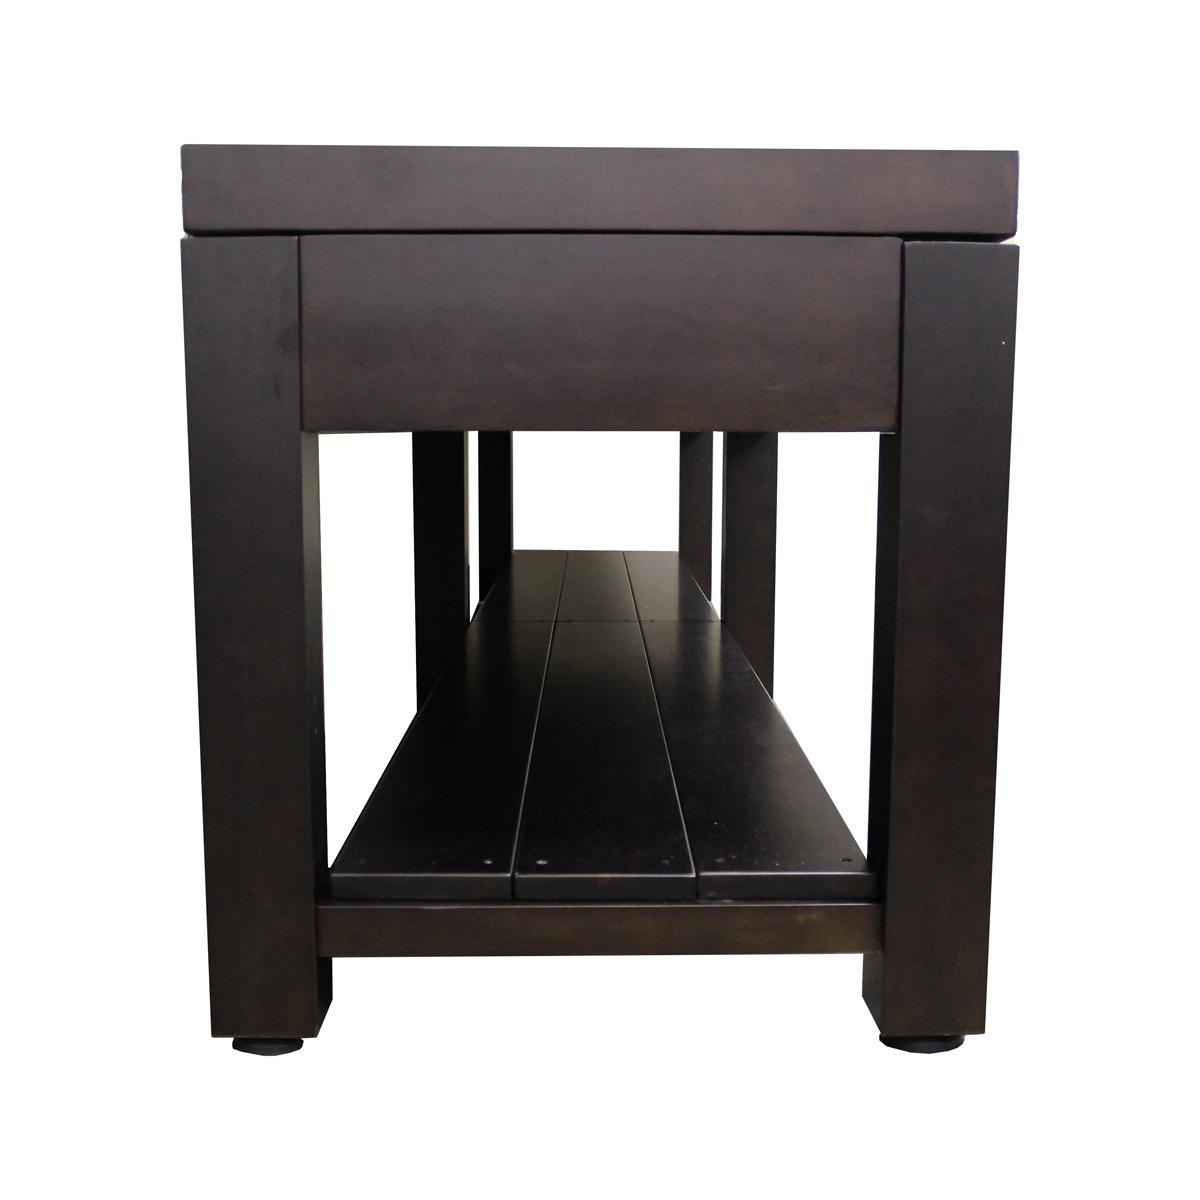 Solid Aspen wood cabinet